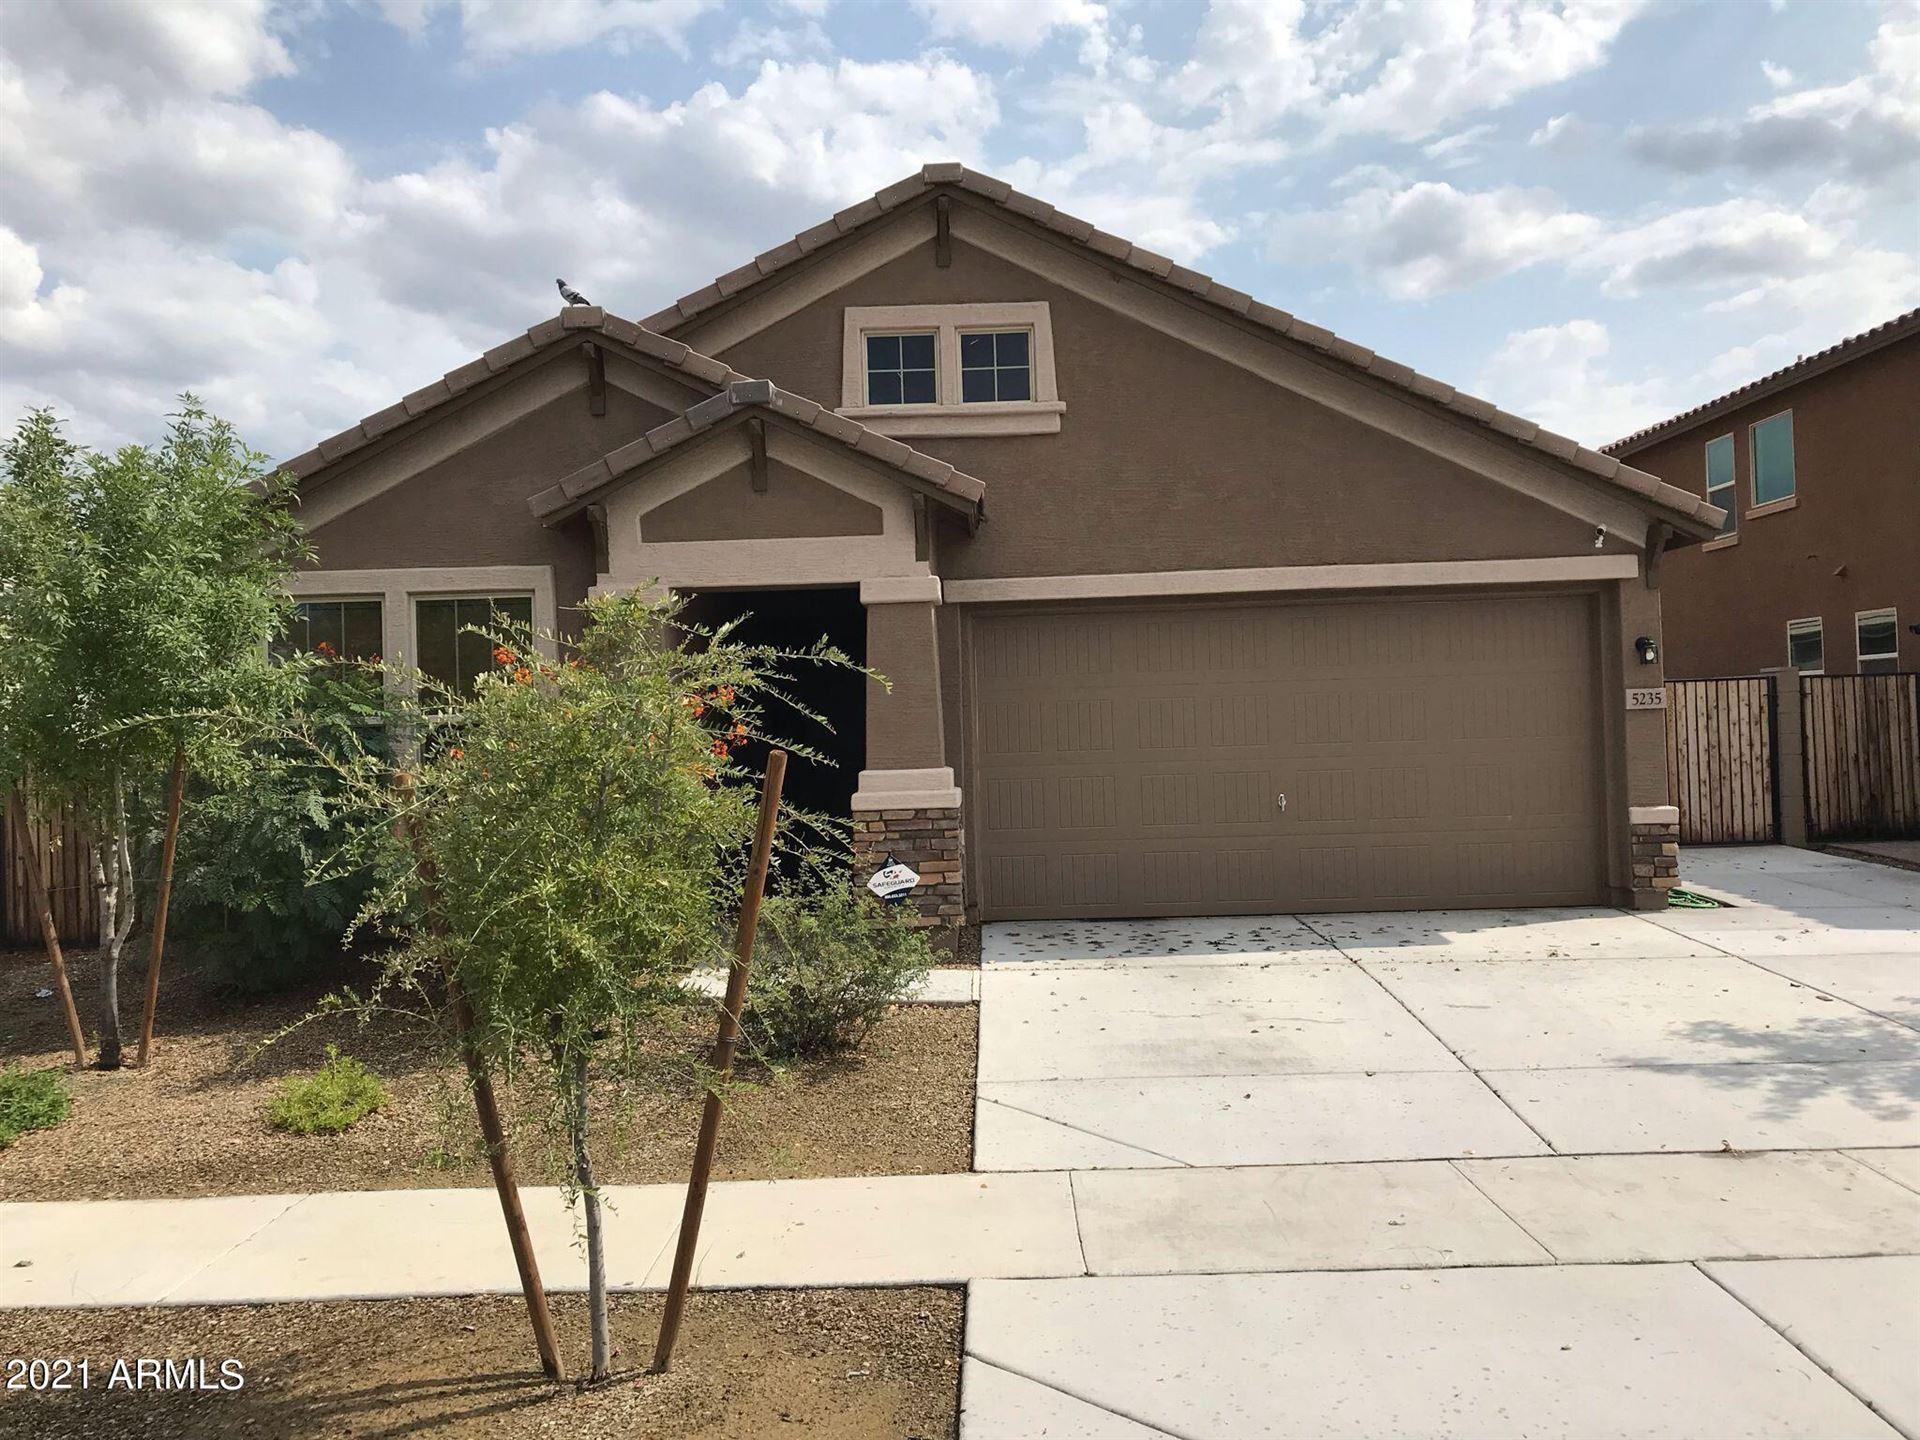 5235 W LEODRA Lane, Laveen, AZ 85339 - MLS#: 6285087